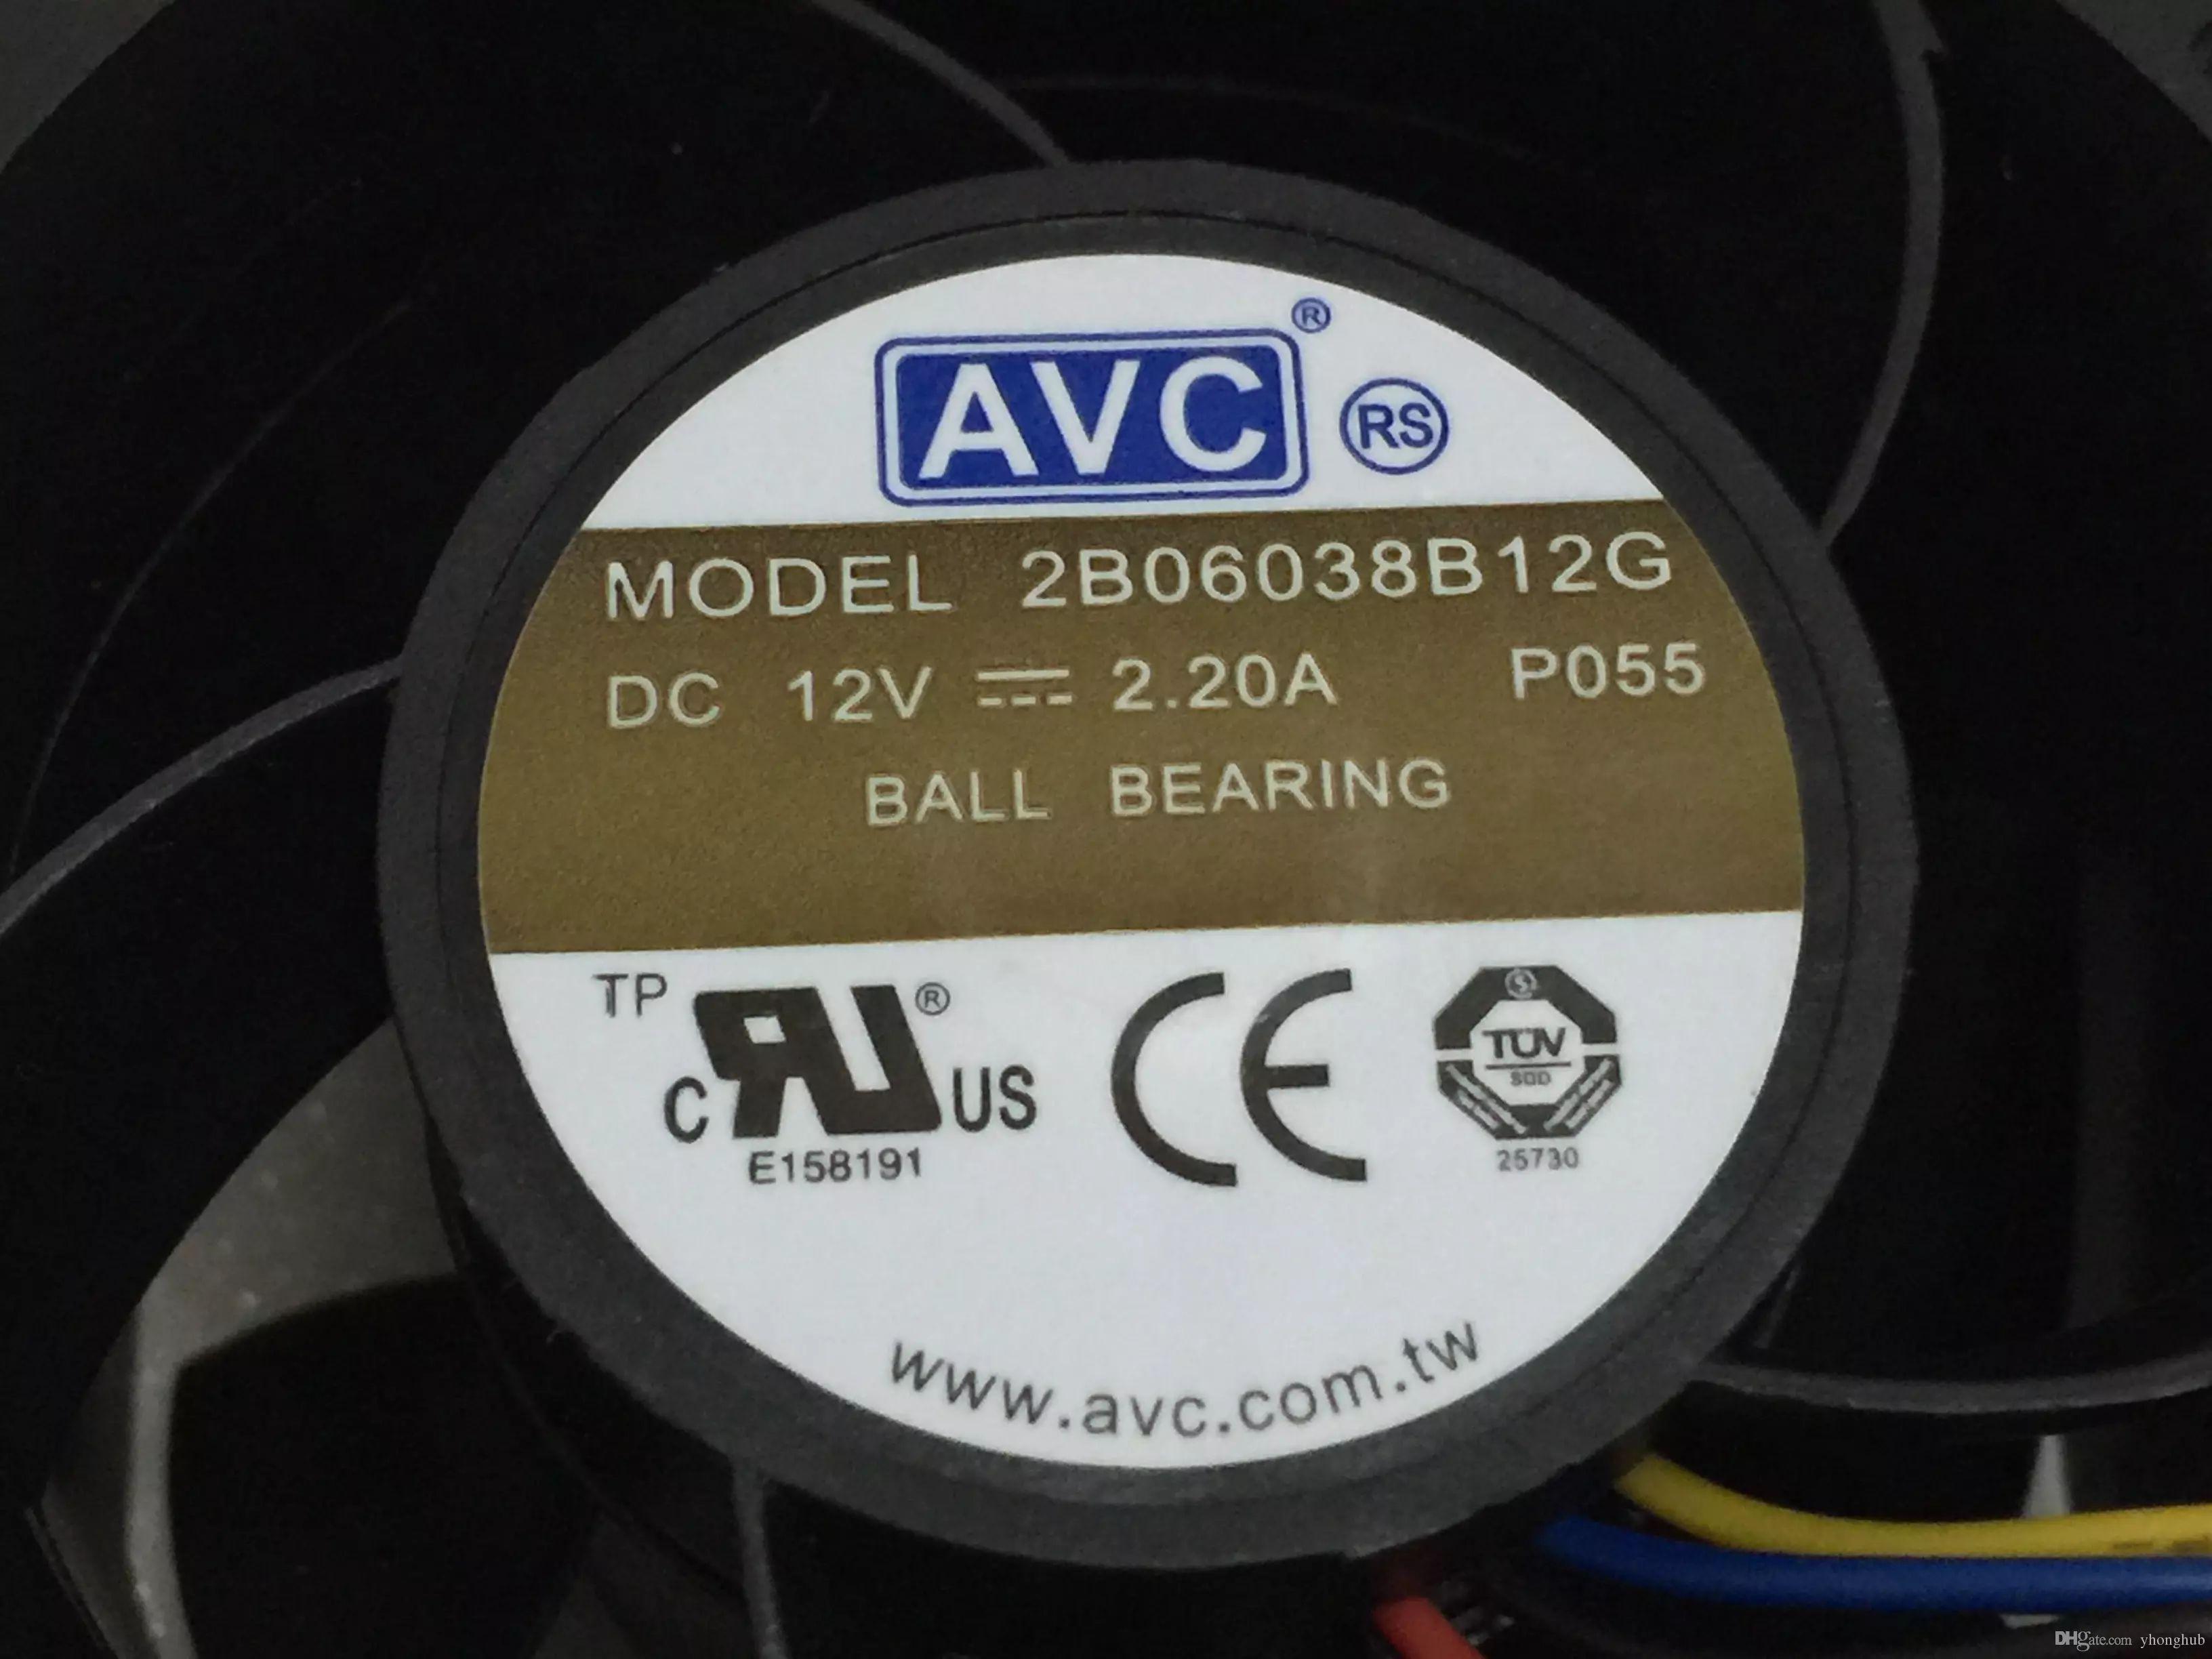 For AVC 2B06038B12G, P055 DC 12V 2.20A, 4-wire 6pin connector 80mm, 60x60x38mm Server Square cooling fan